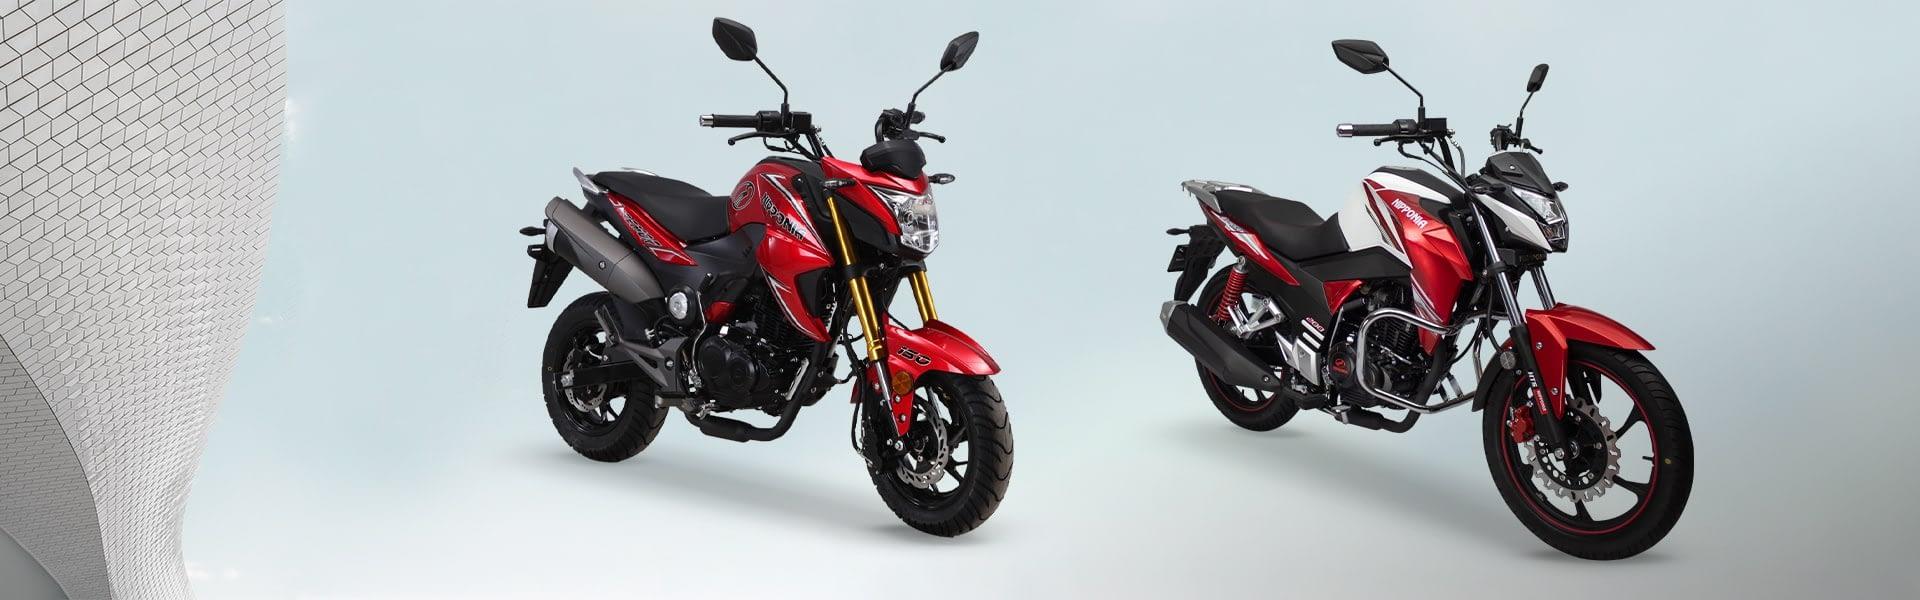 Nipponia Motocicletas